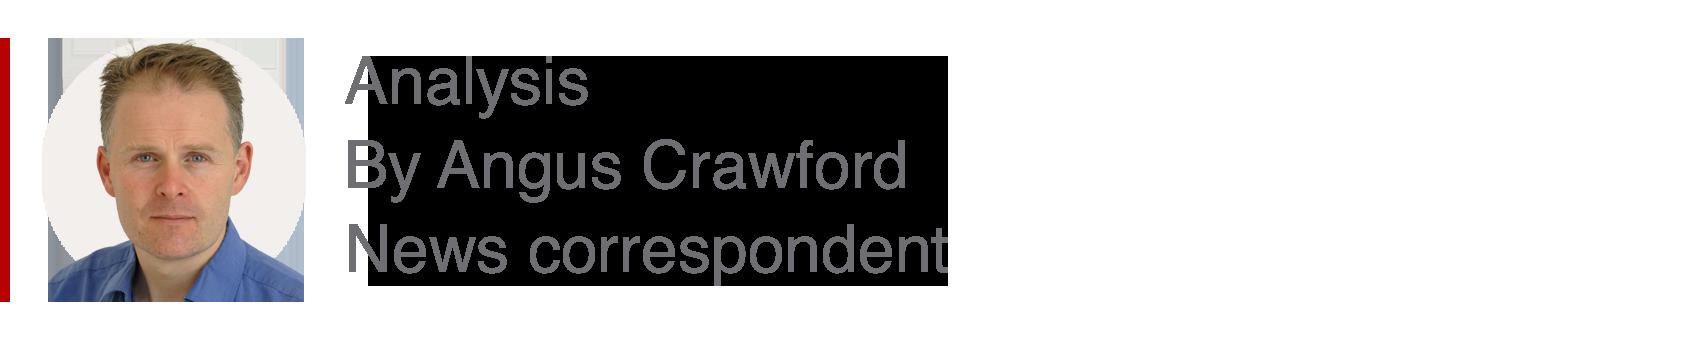 Angus Crawford